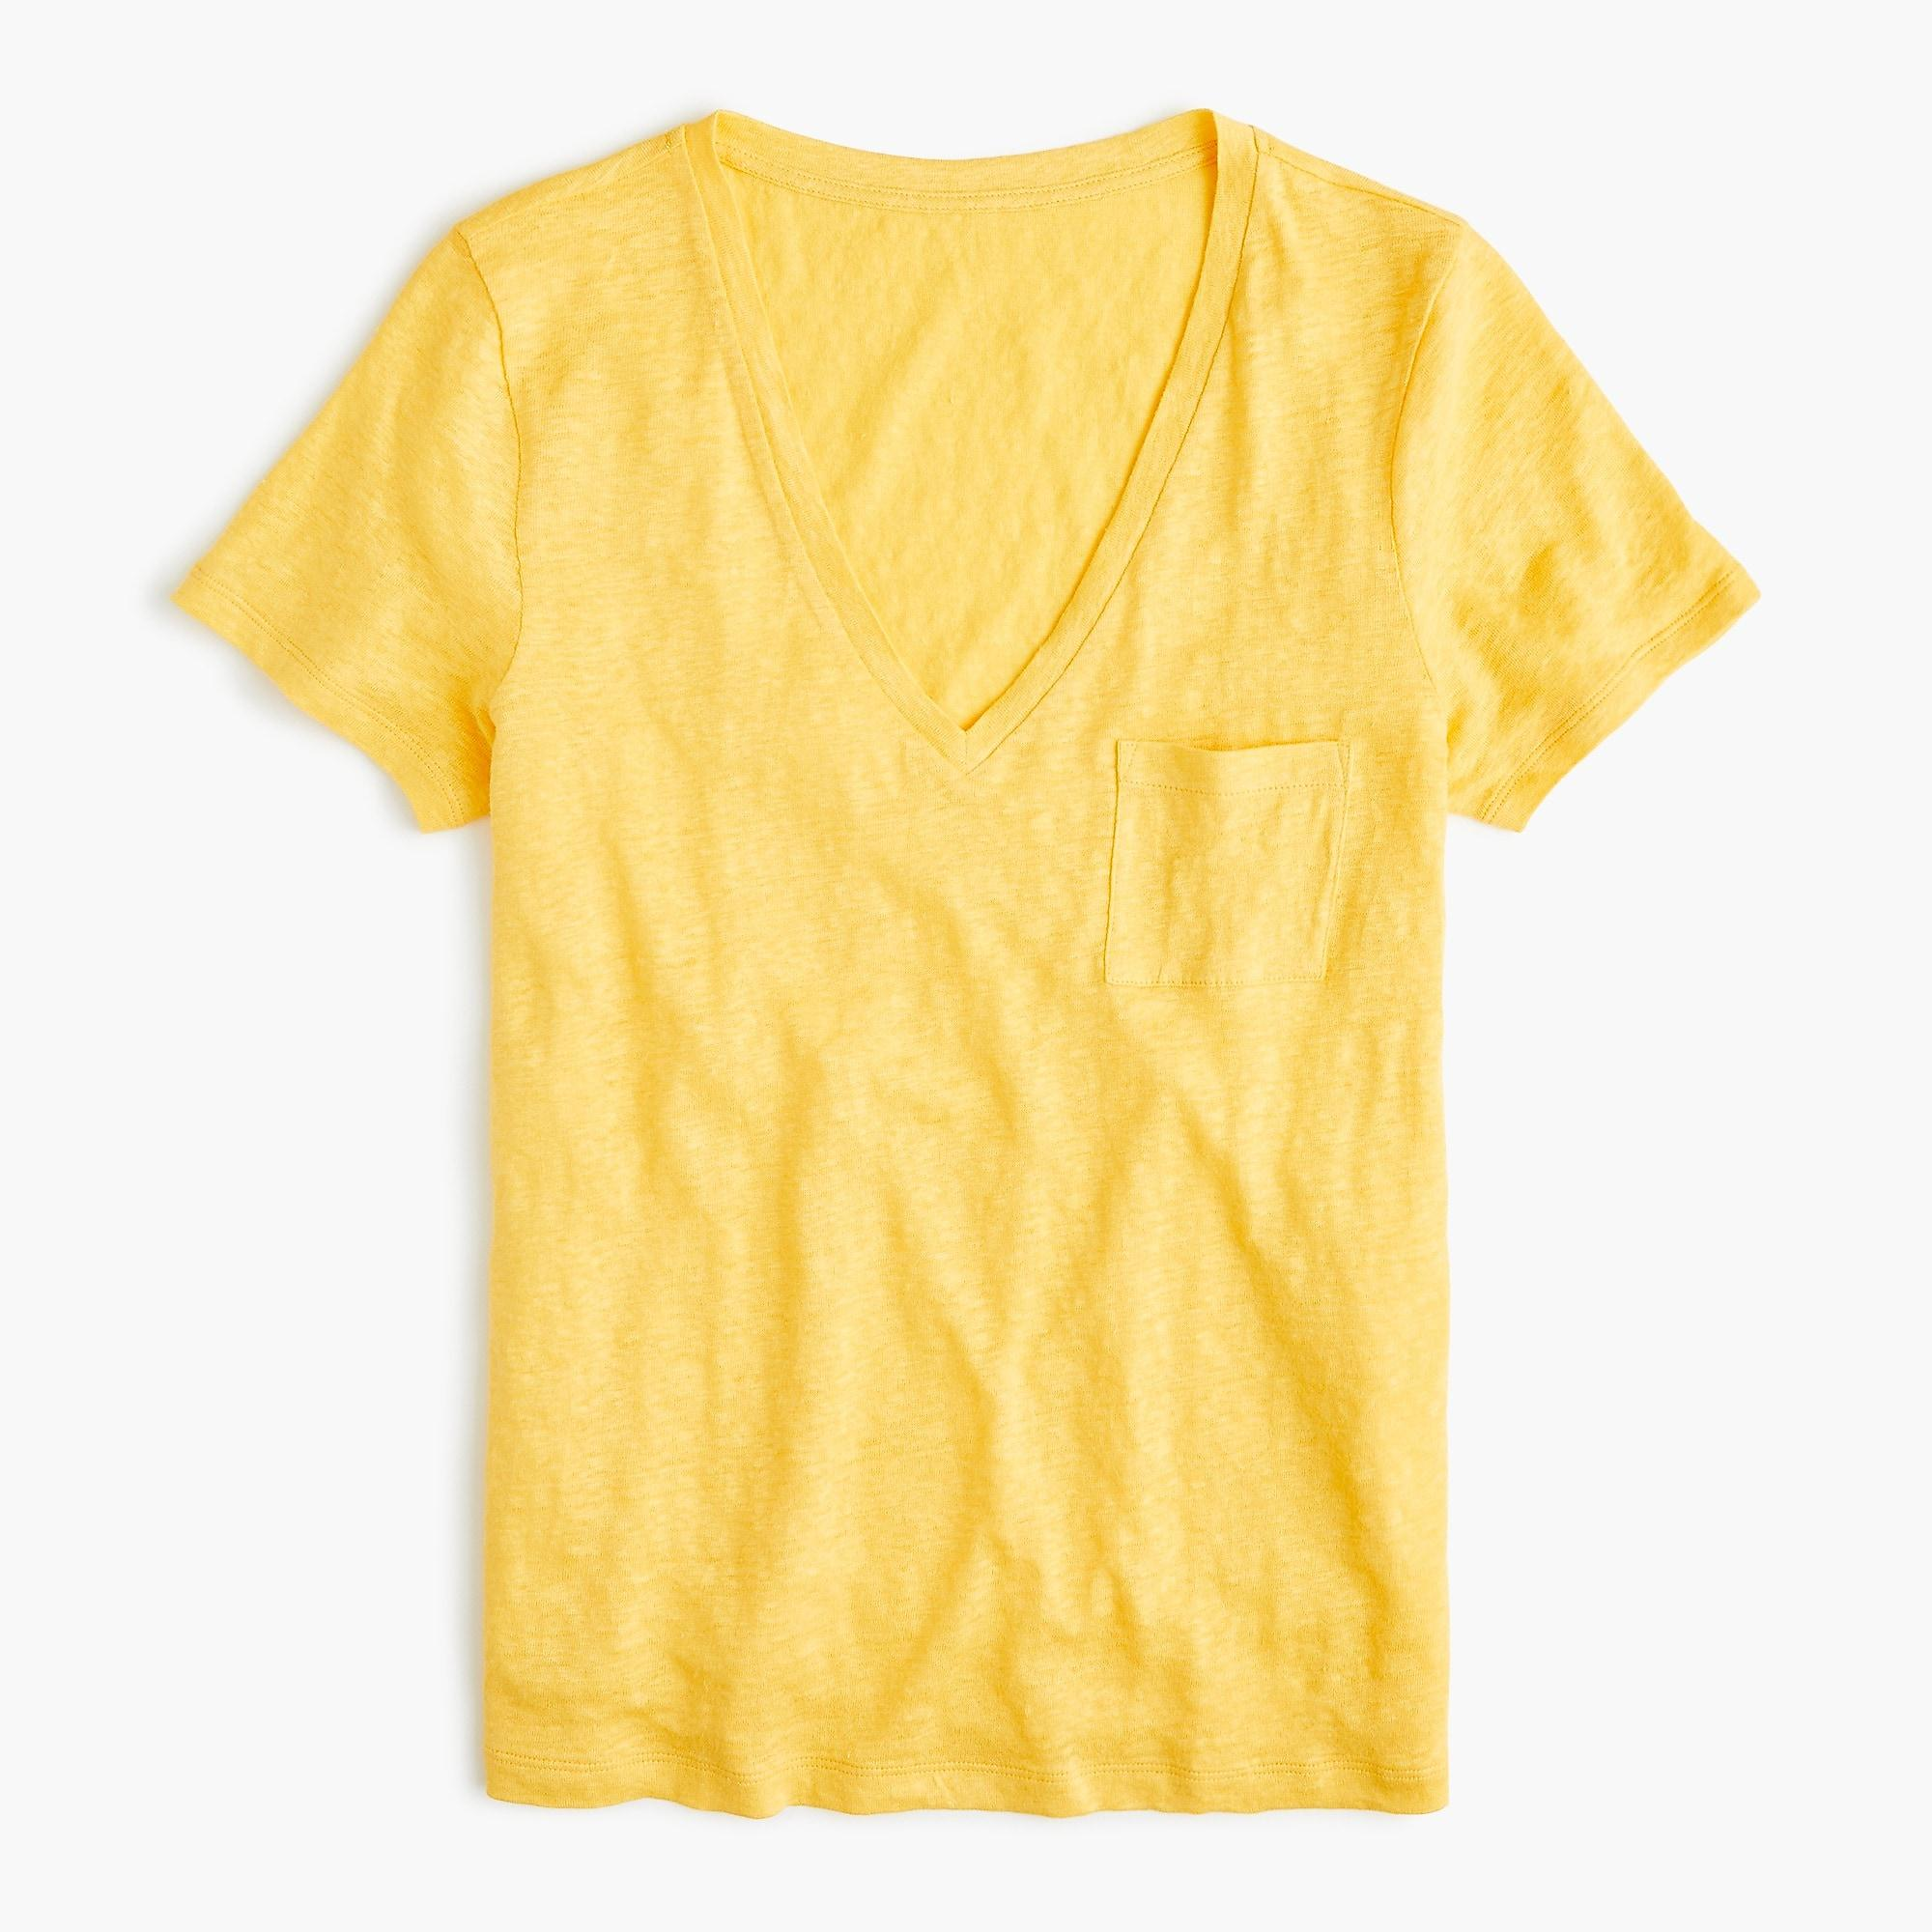 23548724f34a1e J.Crew Linen V-neck Pocket T-shirt in Yellow - Lyst